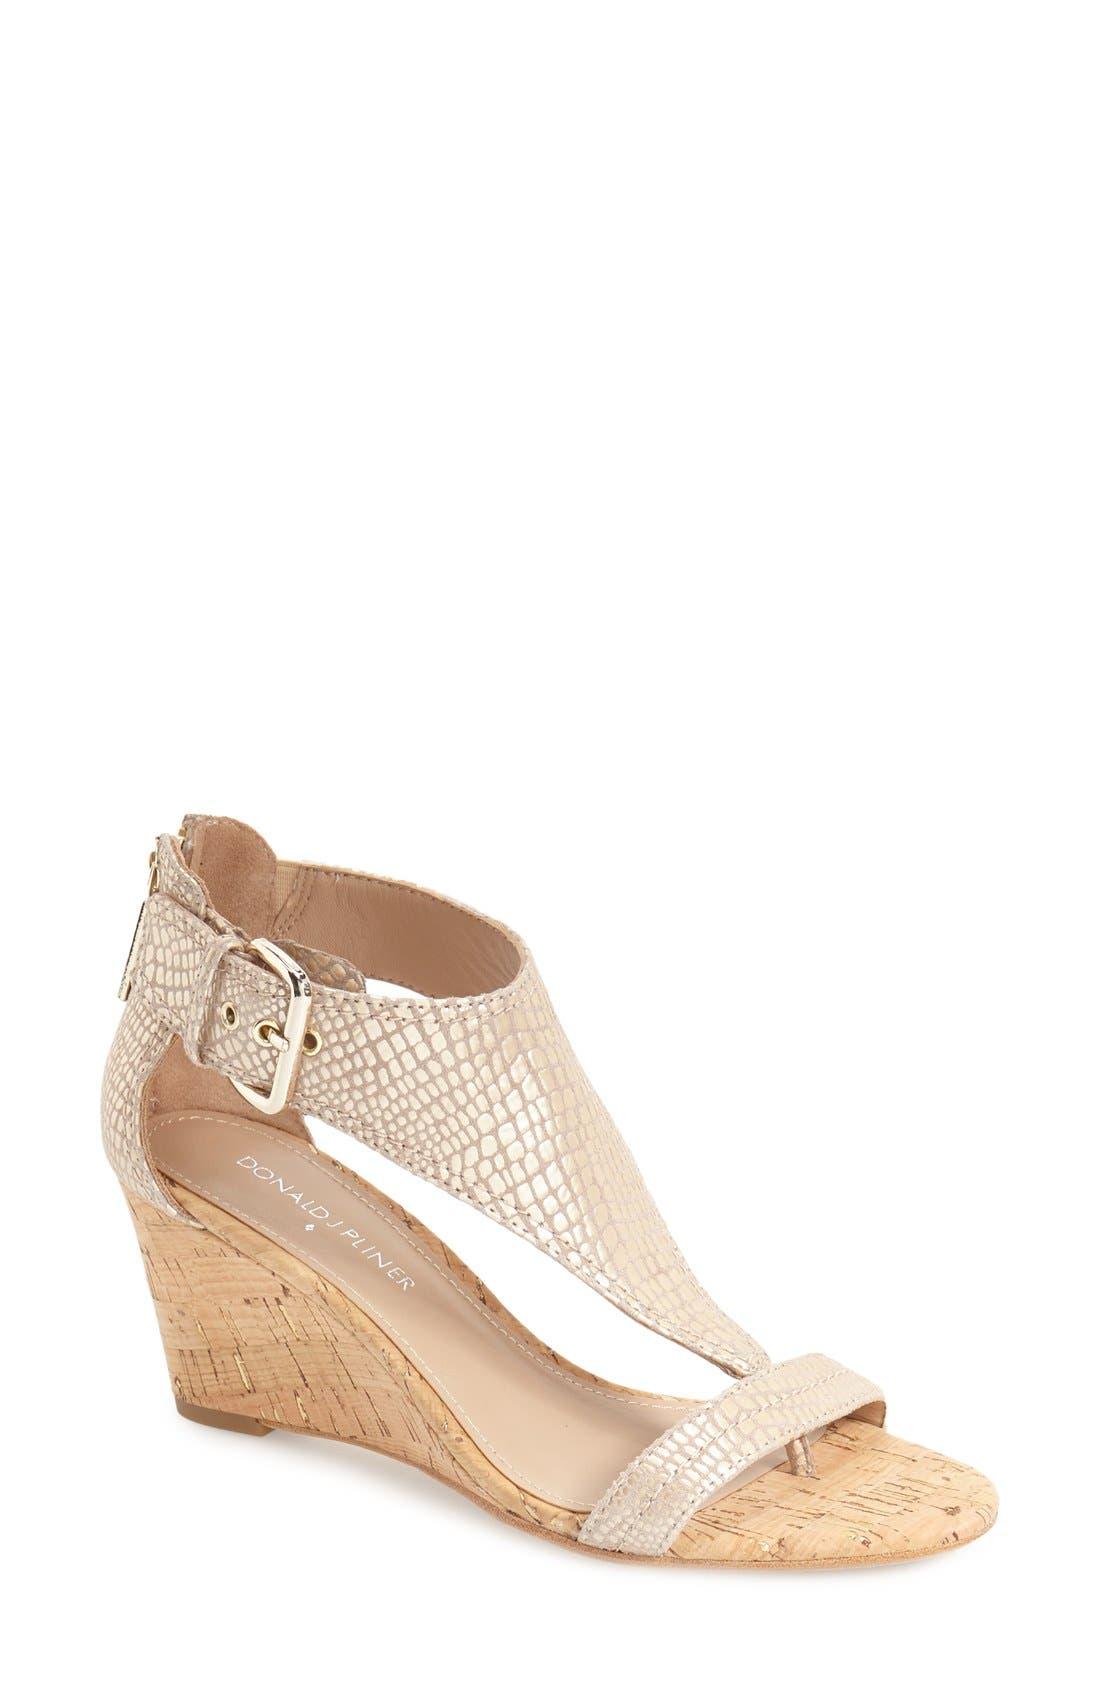 Alternate Image 1 Selected - Donald J Pliner 'June' T-Strap Wedge Sandal (Women)